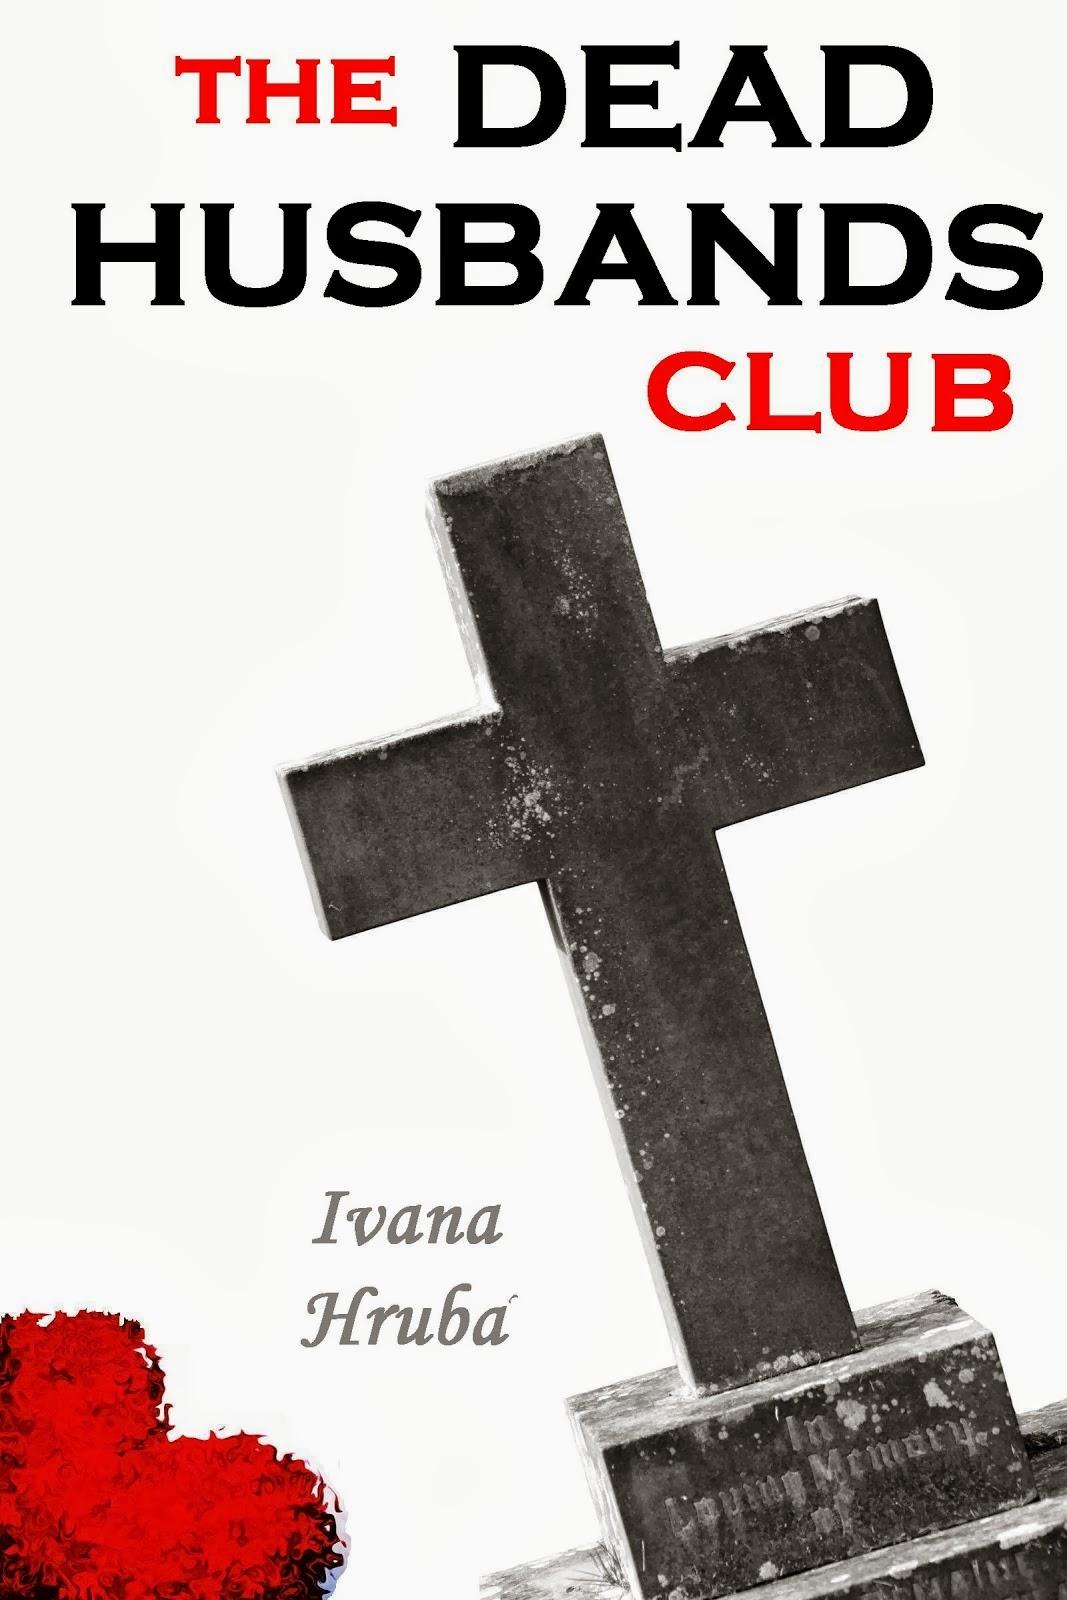 The Dead Husbands Club